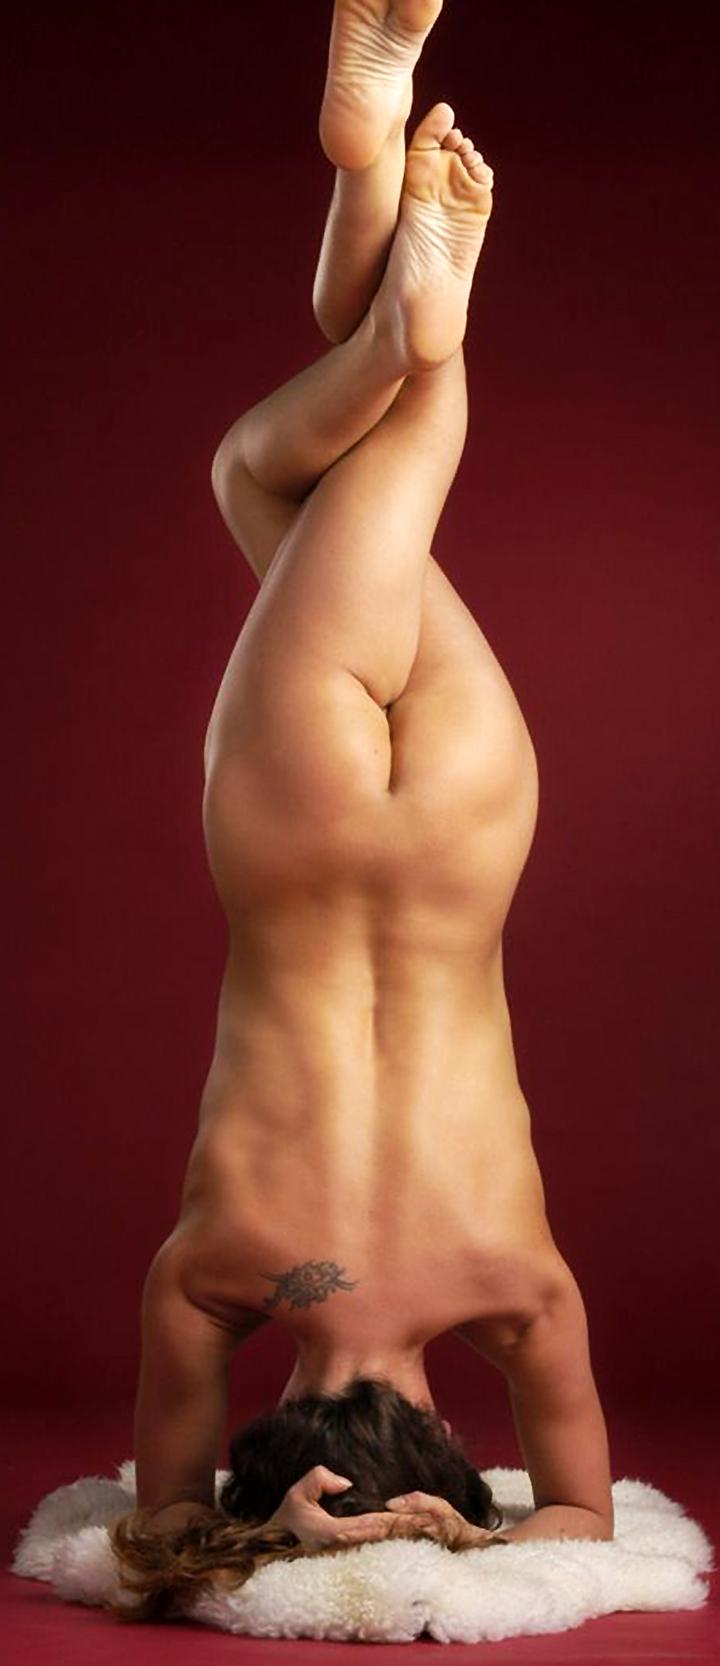 Flexible Naked Girls – Compilation